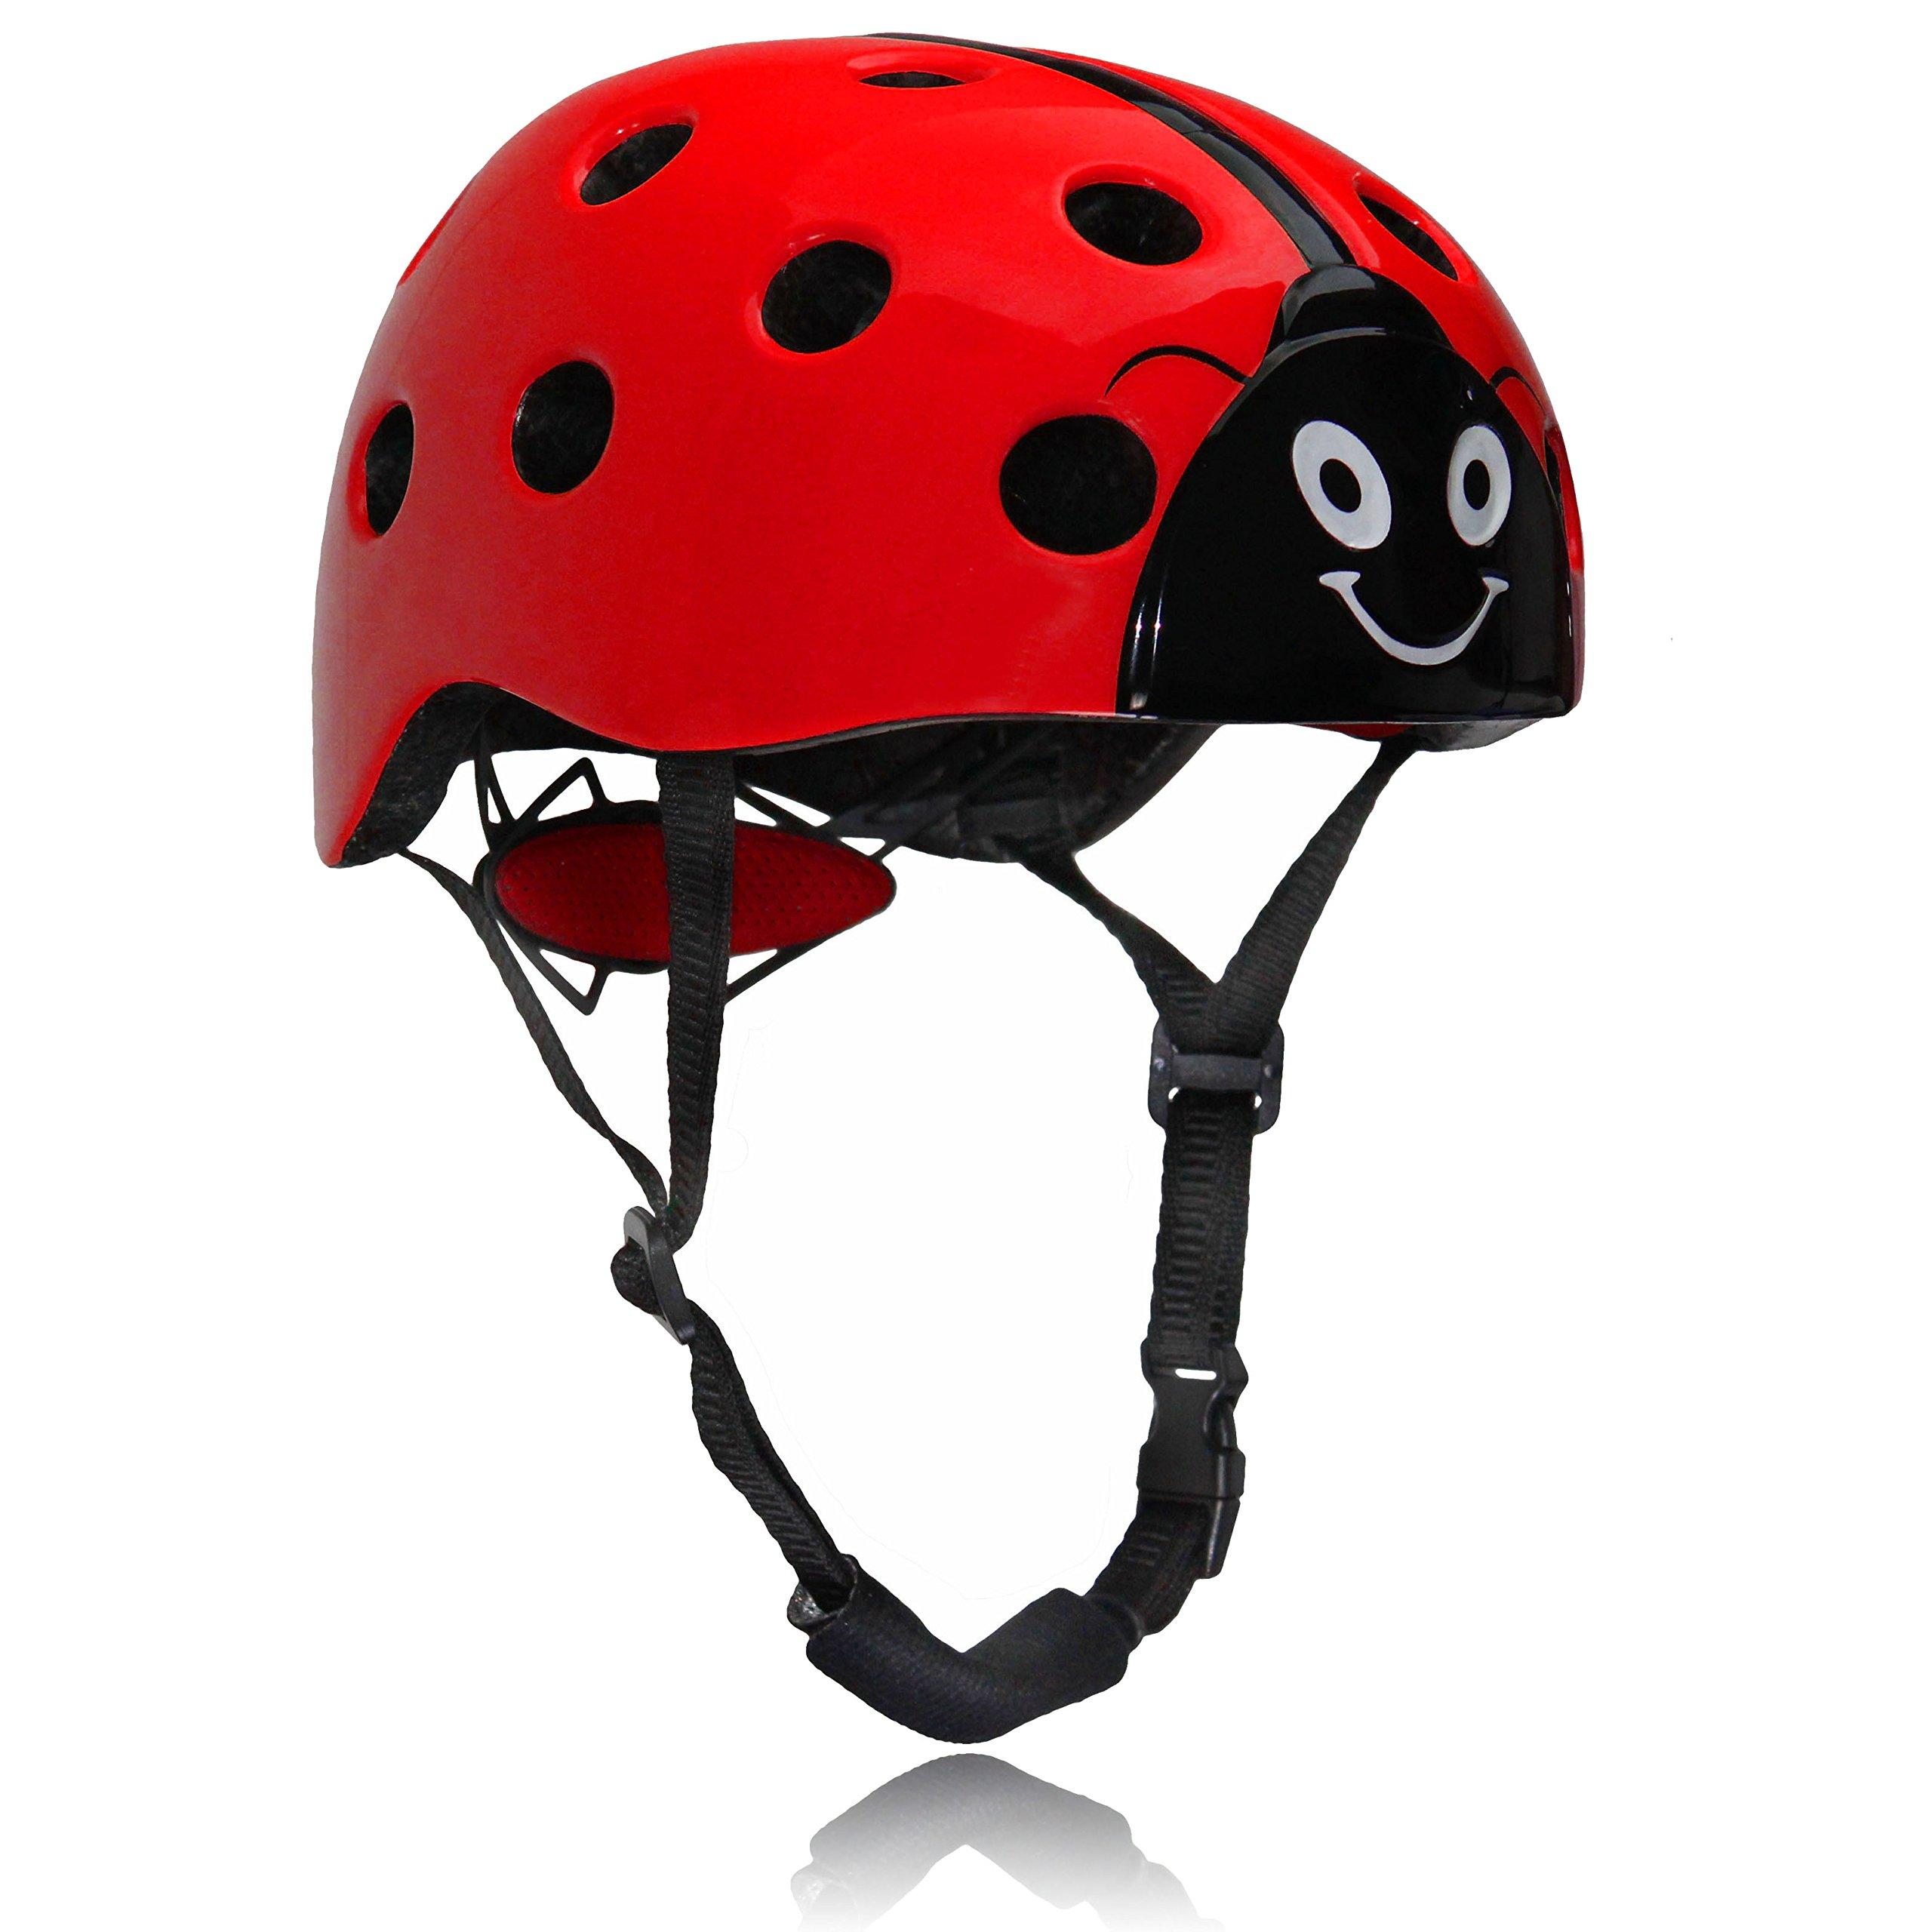 Dostar Kids Multi-sport Adjustable Ladybug Helmet –Safety Comfort Cycling Skateboarding Skating Durable Kids Bike Helmets for 3 to 10 Years old Boys/Girls (Red)